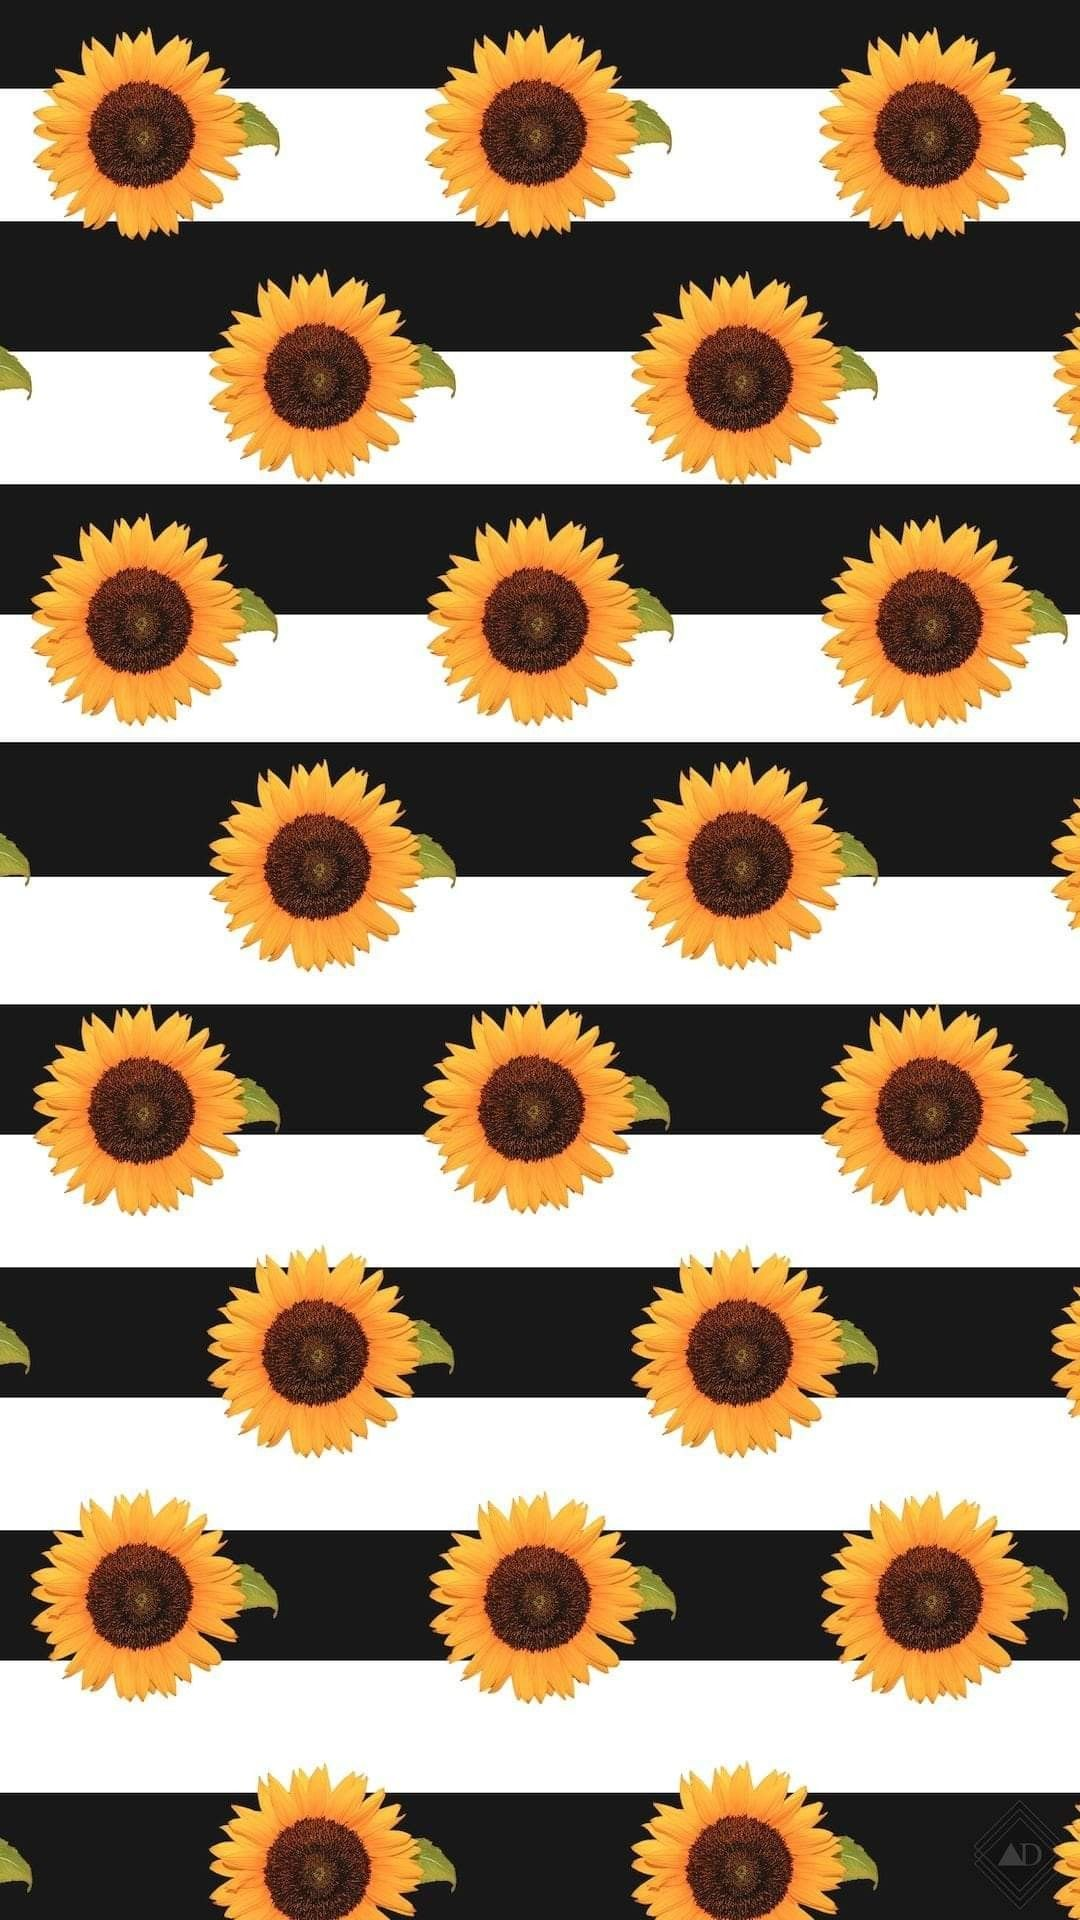 Pin by Cyndy Simons on fall screensavers   Sunflower ...